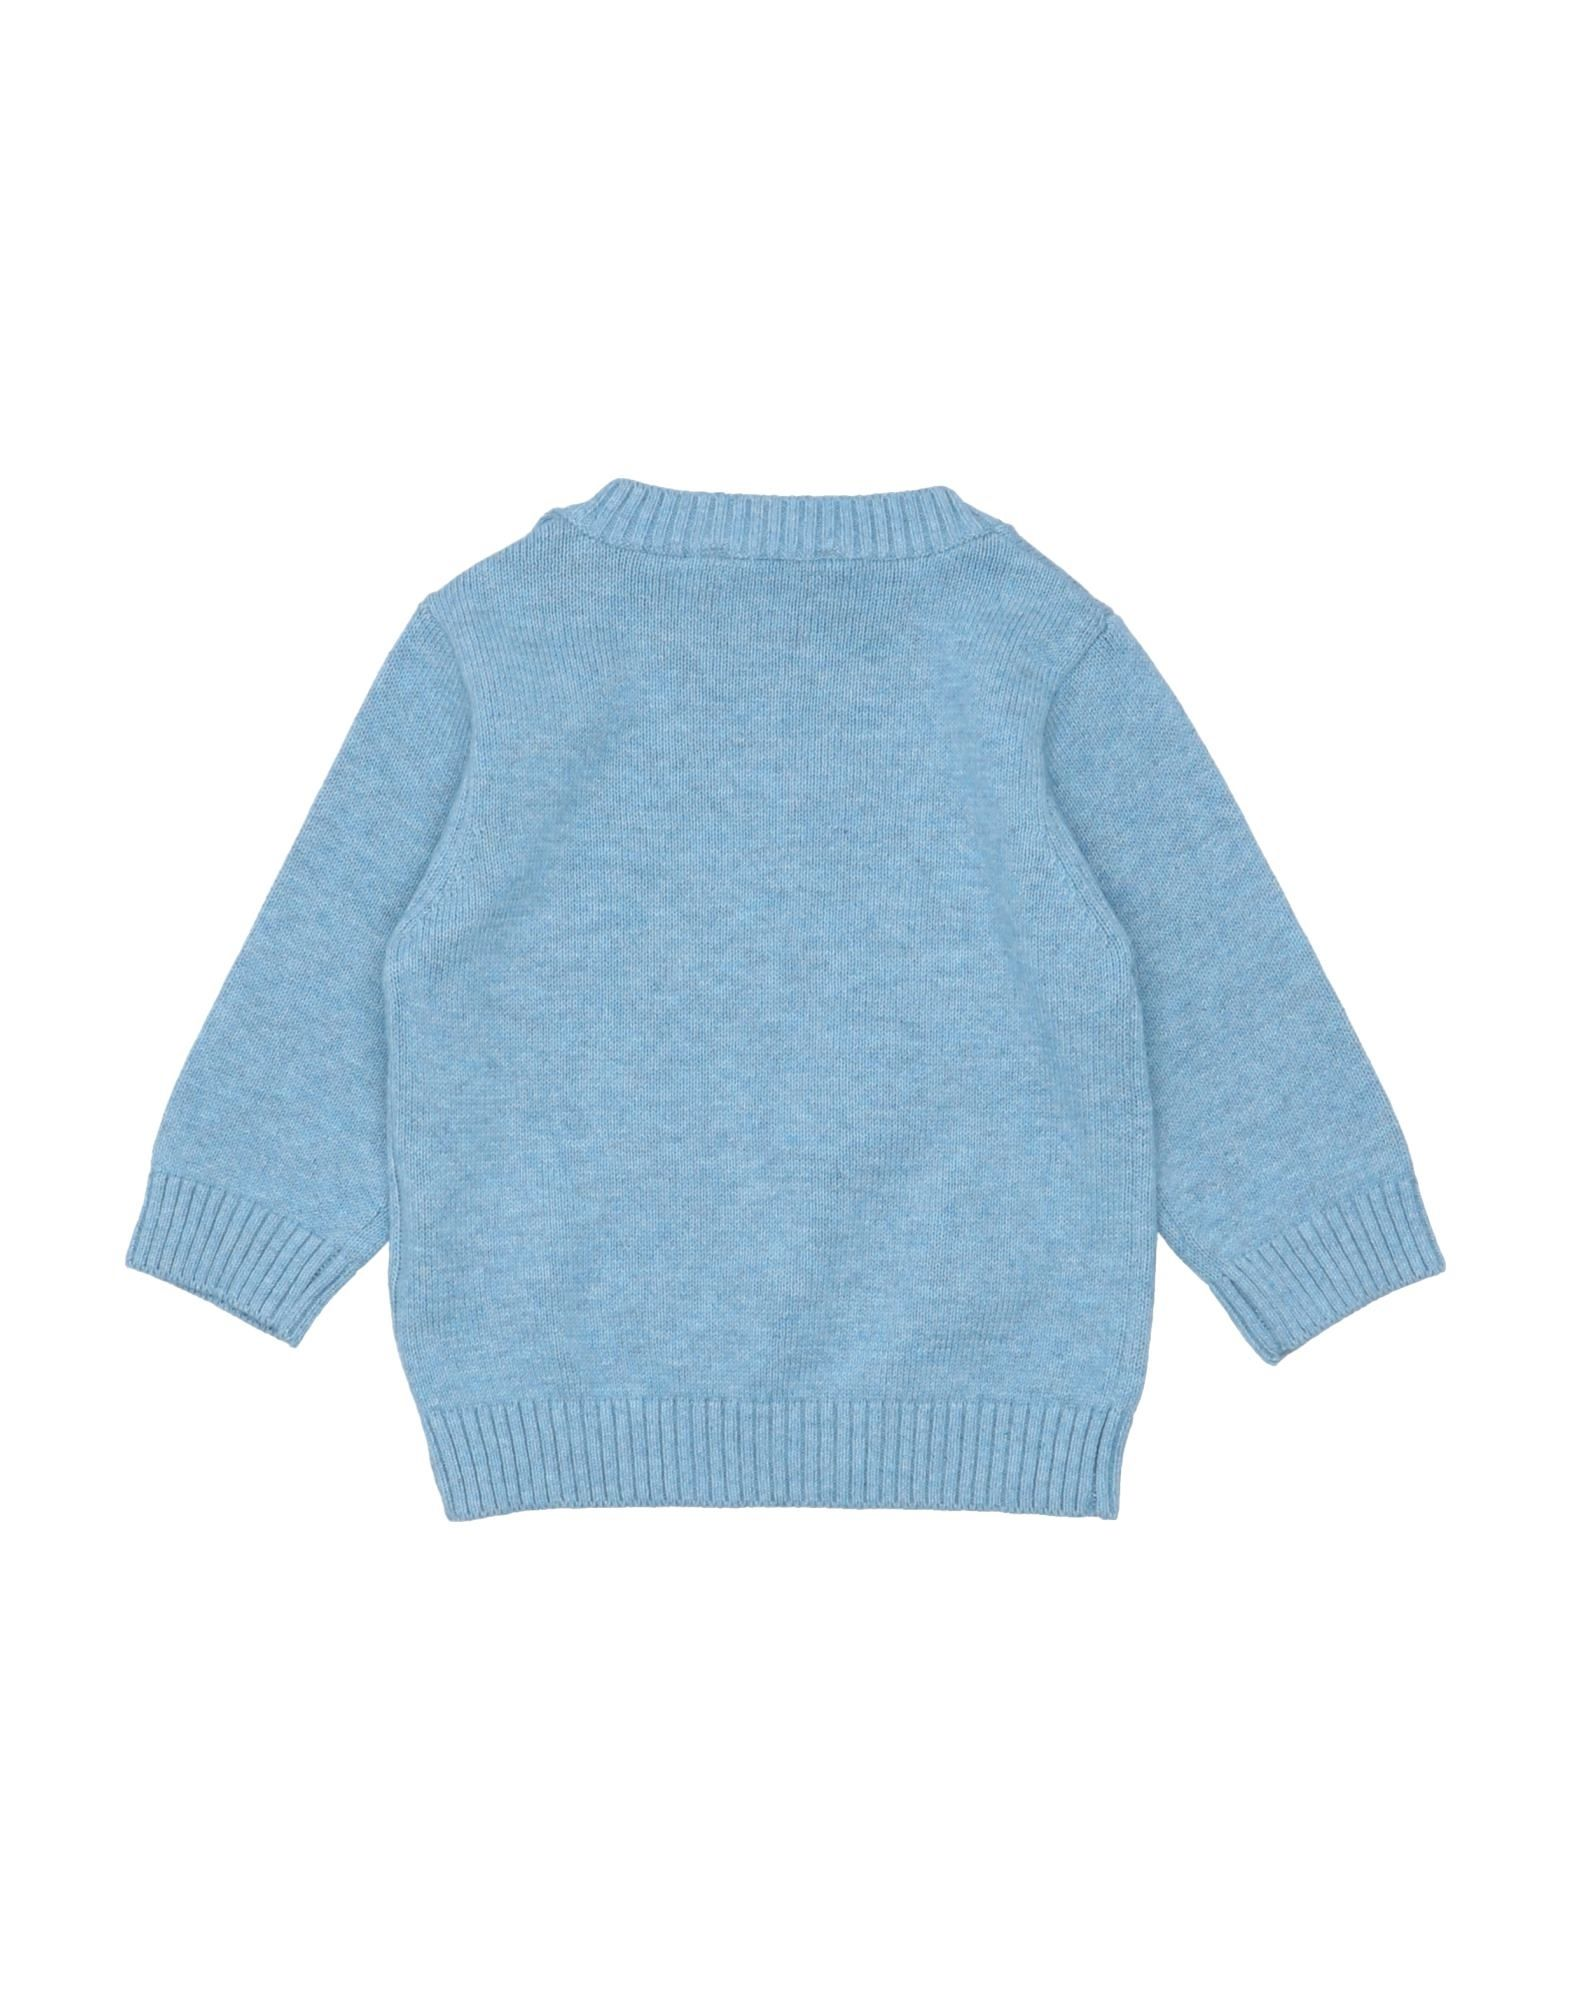 Timberland - Knitwear - Jumpers - On Yoox.com